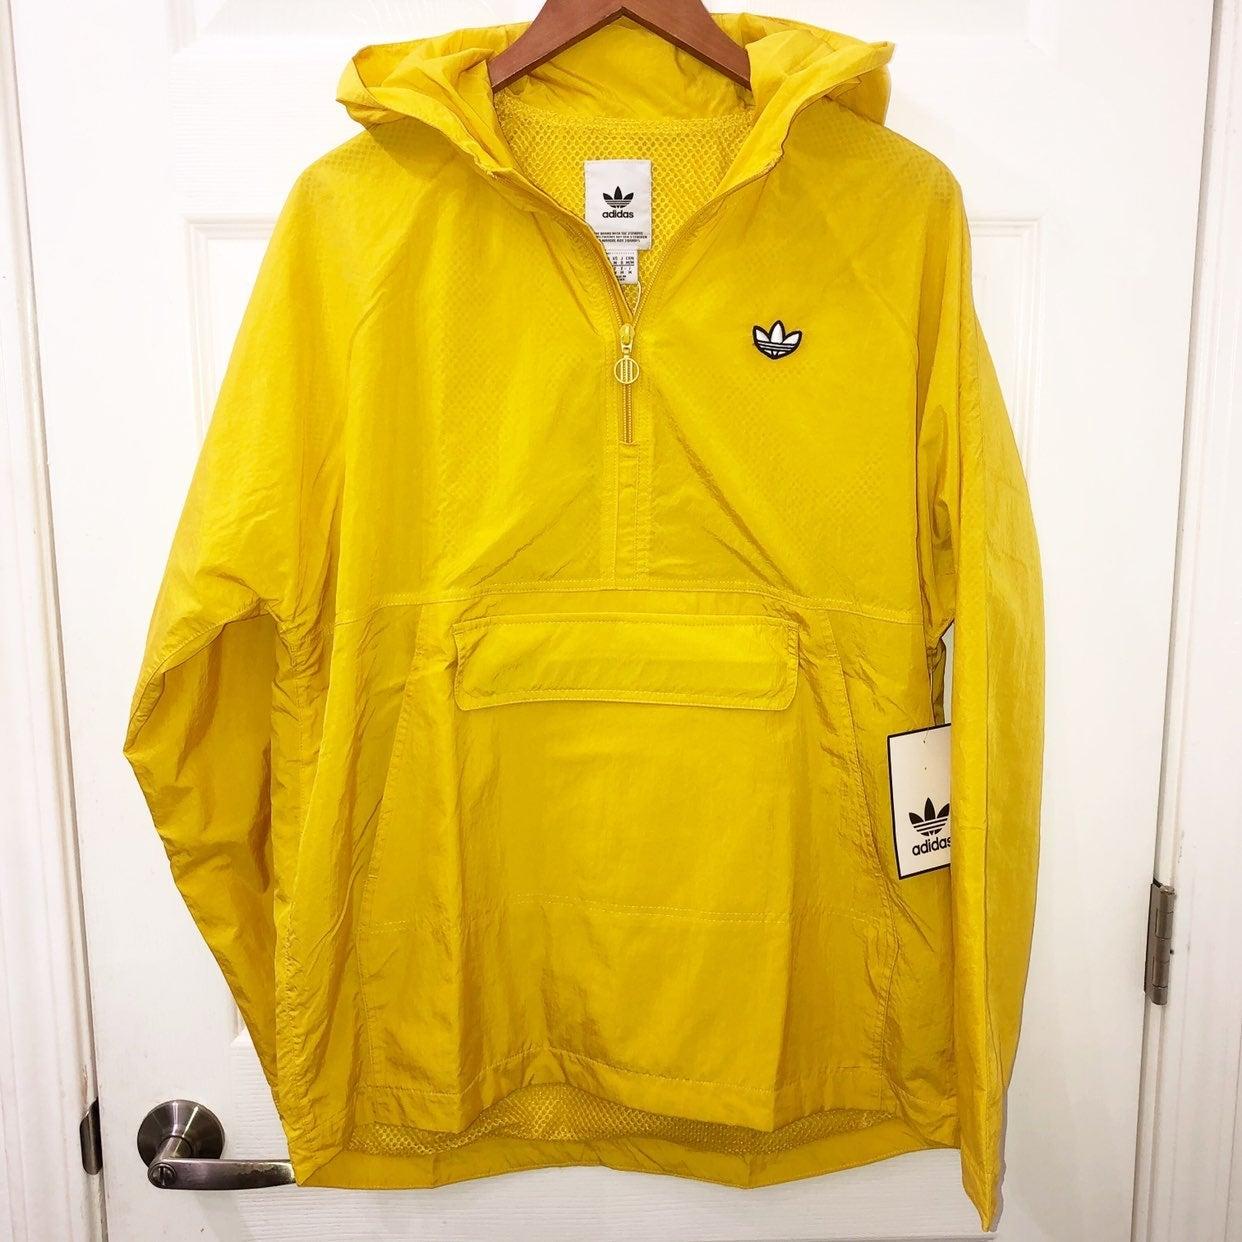 NWT Adidas lightweight jacket size Mediu